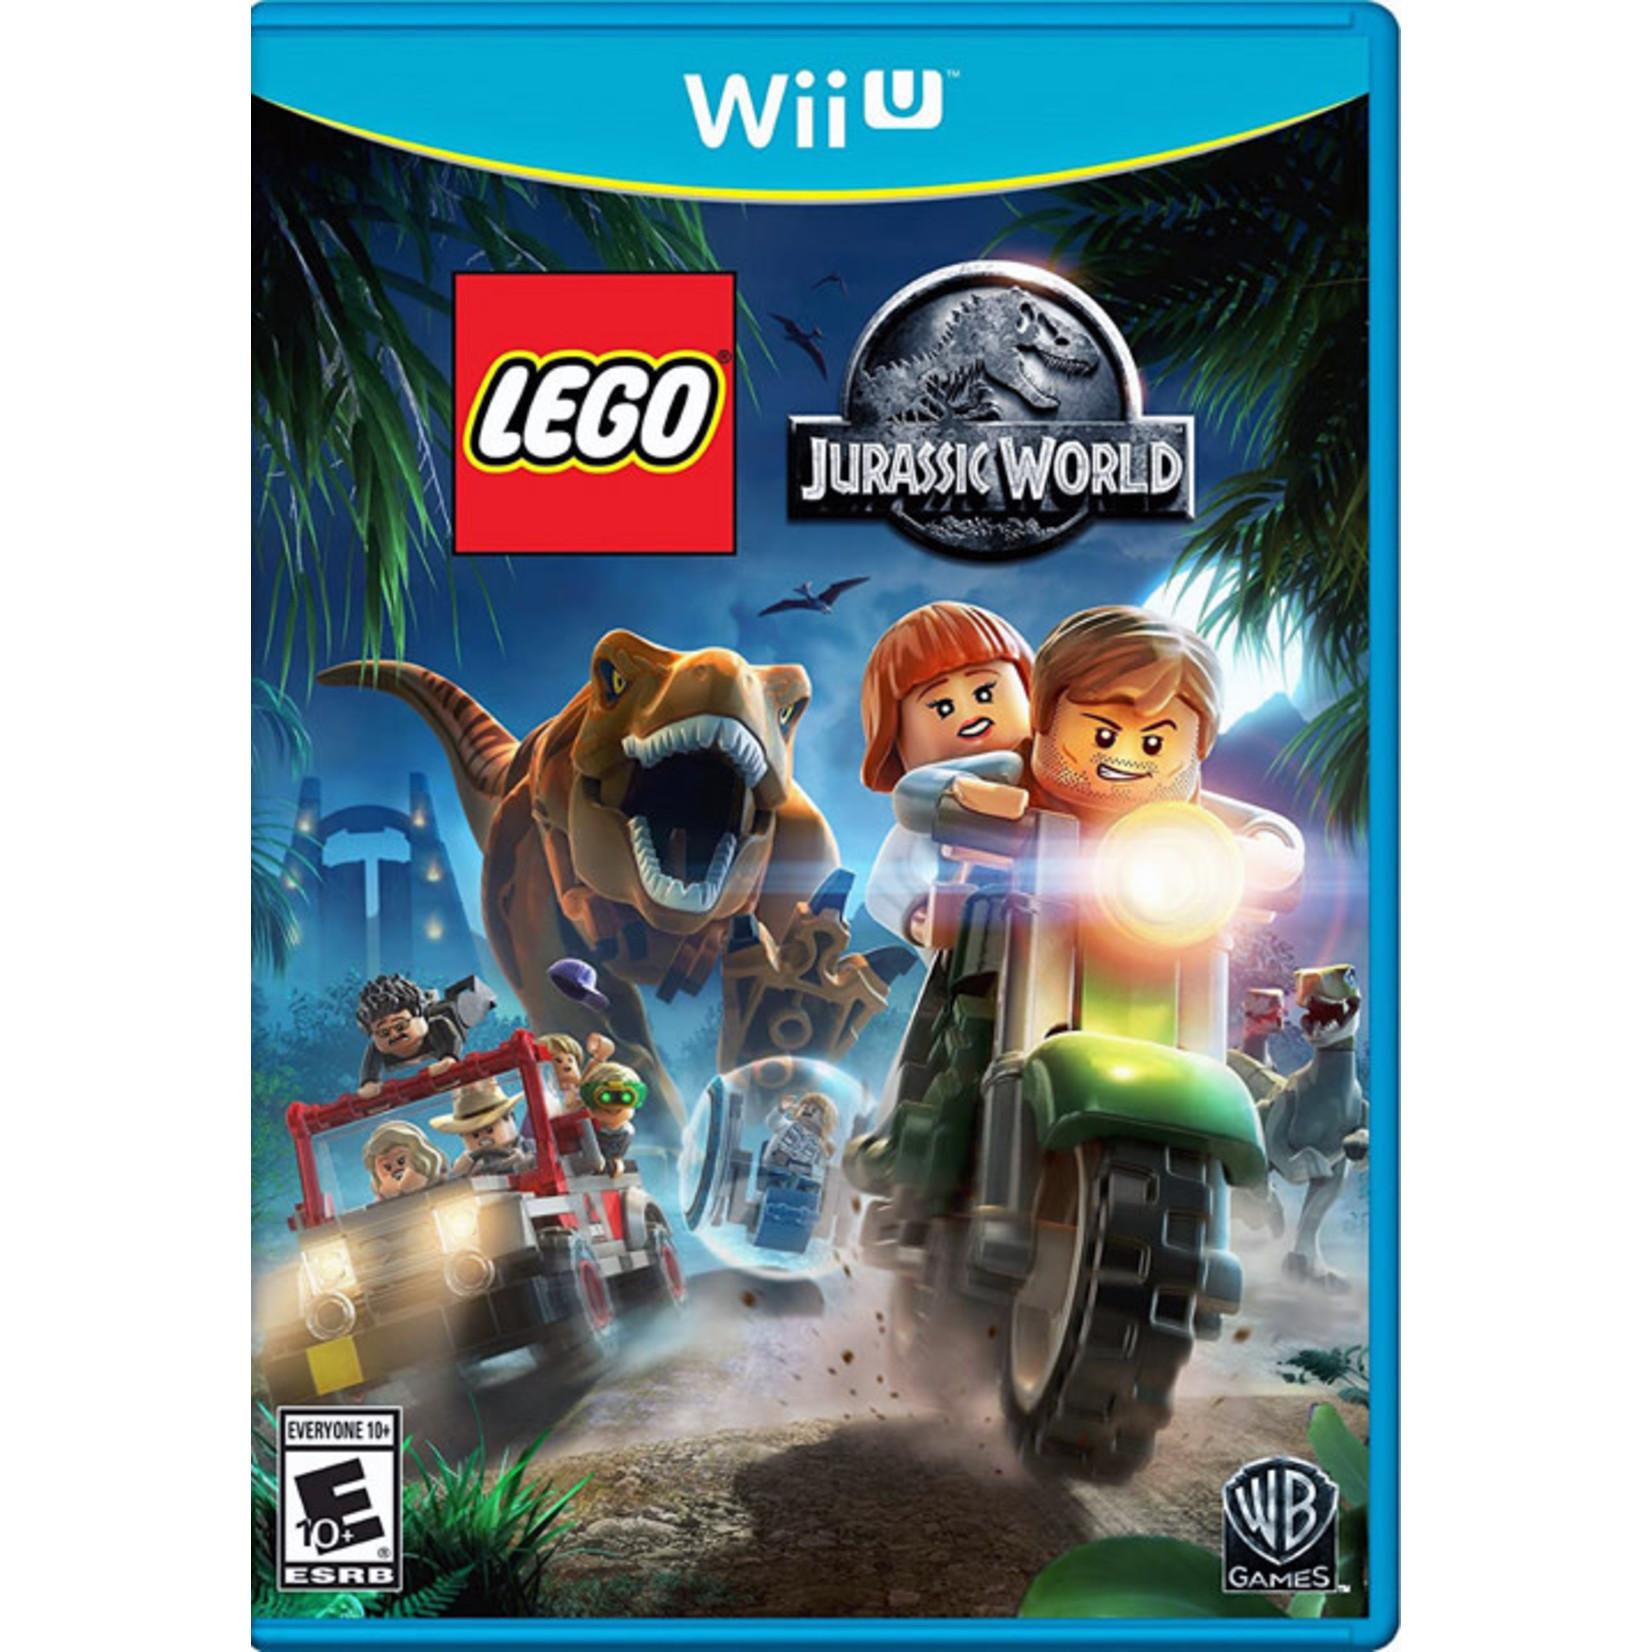 WIIU-LEGO Jurassic World